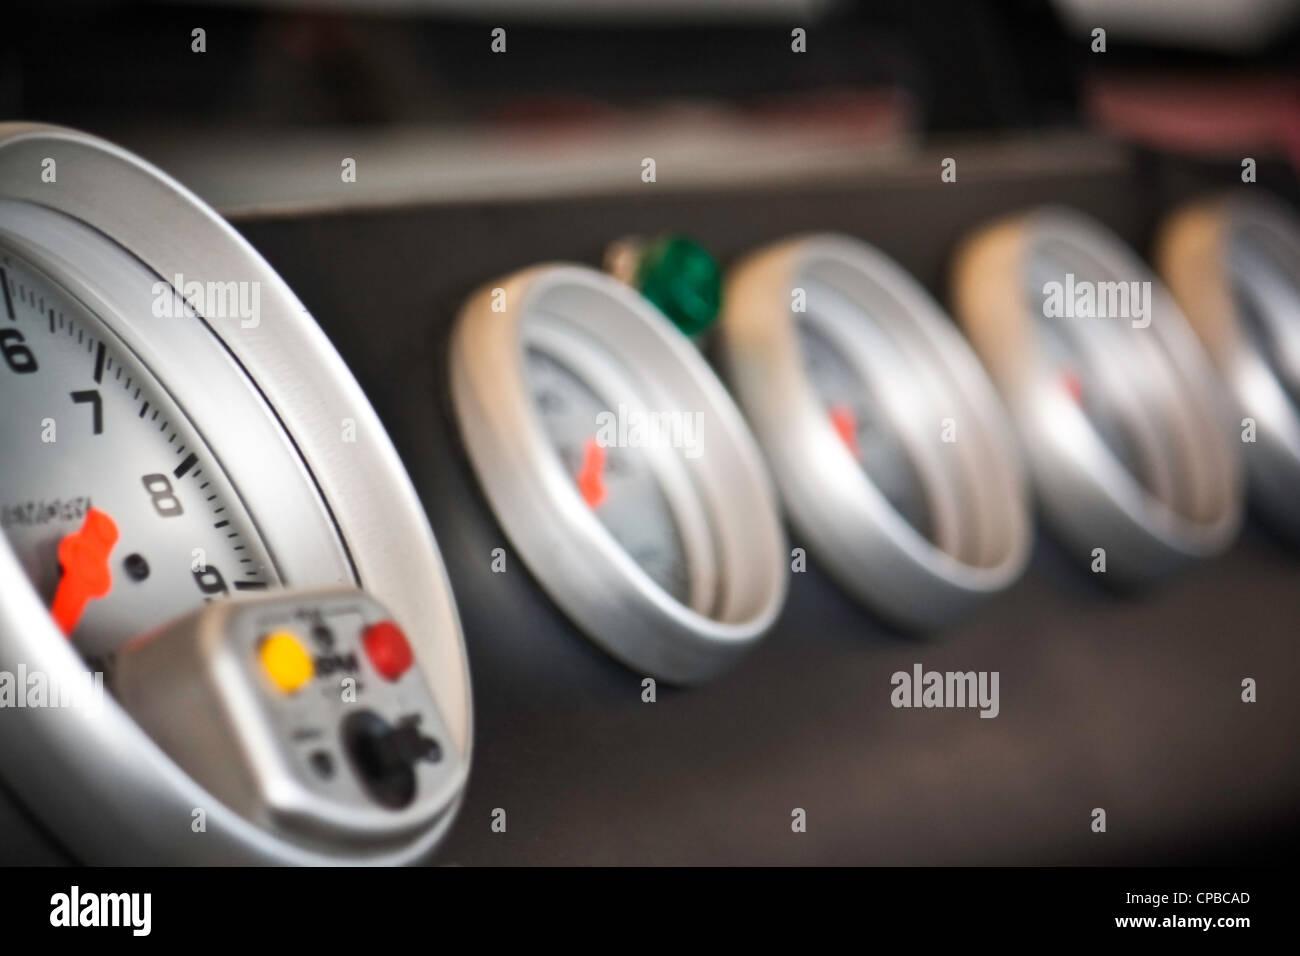 race car dials inside a nascar style vehicle - Stock Image